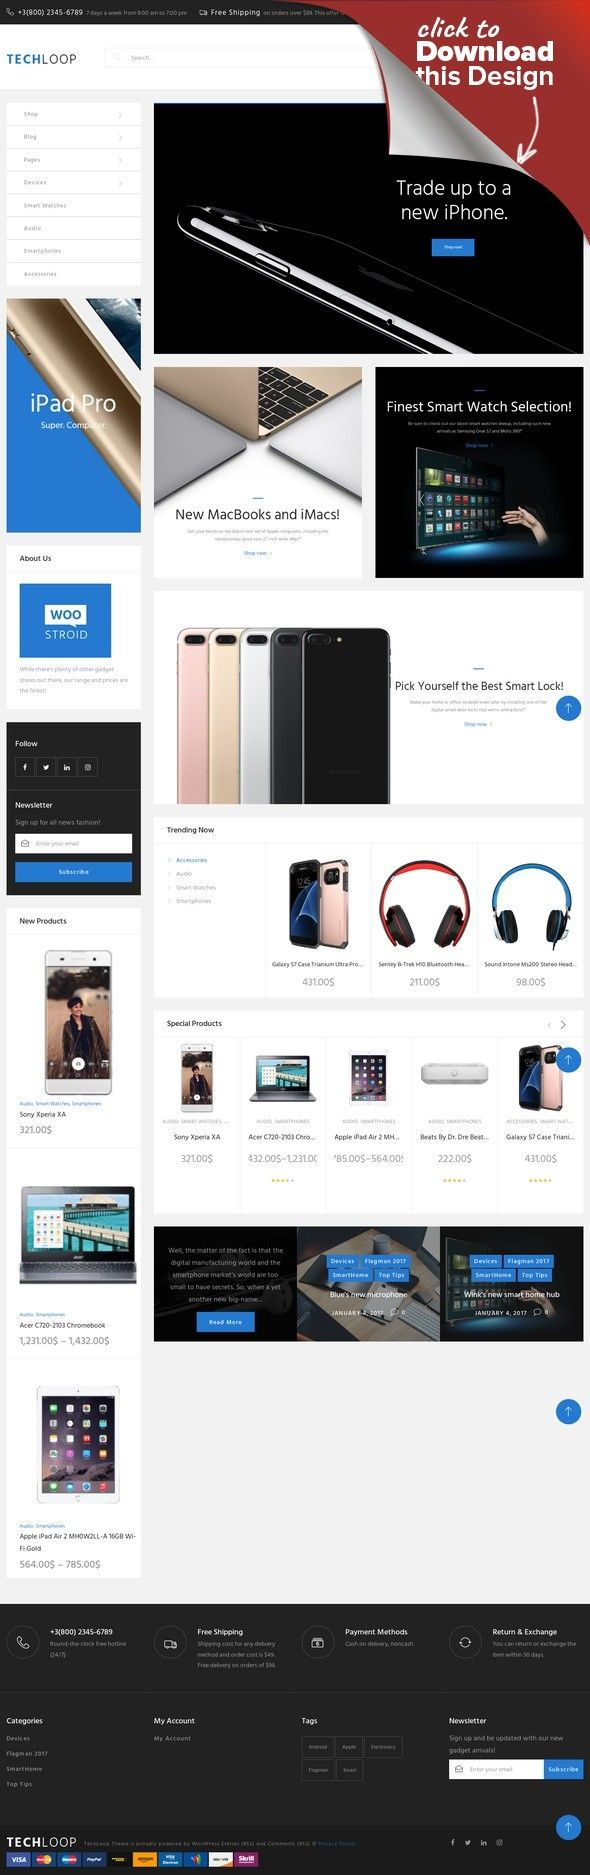 174 best Store Web Design images on Pinterest